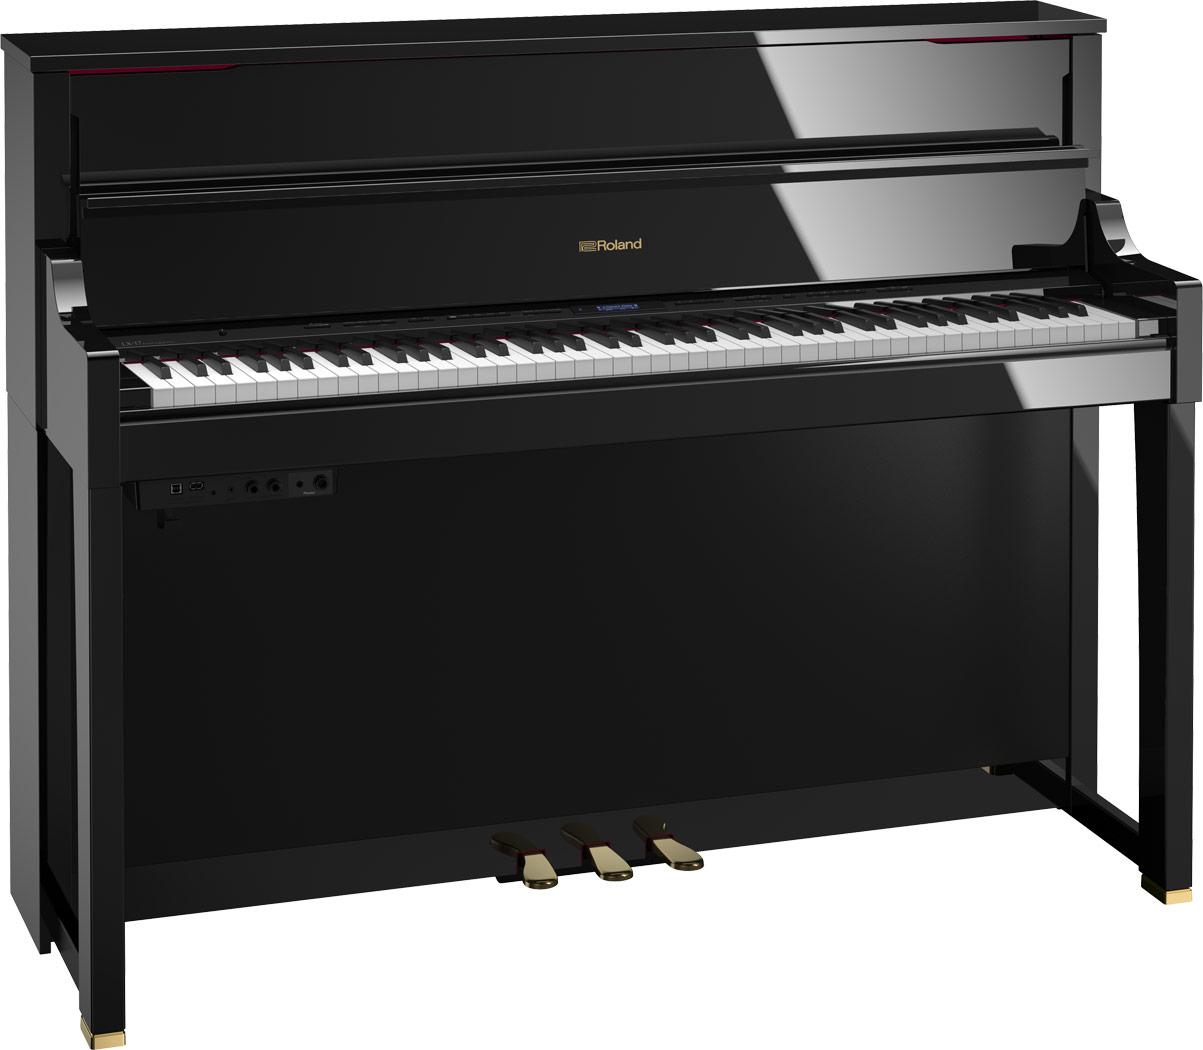 LX-17 Home Piano in Polished Ebony